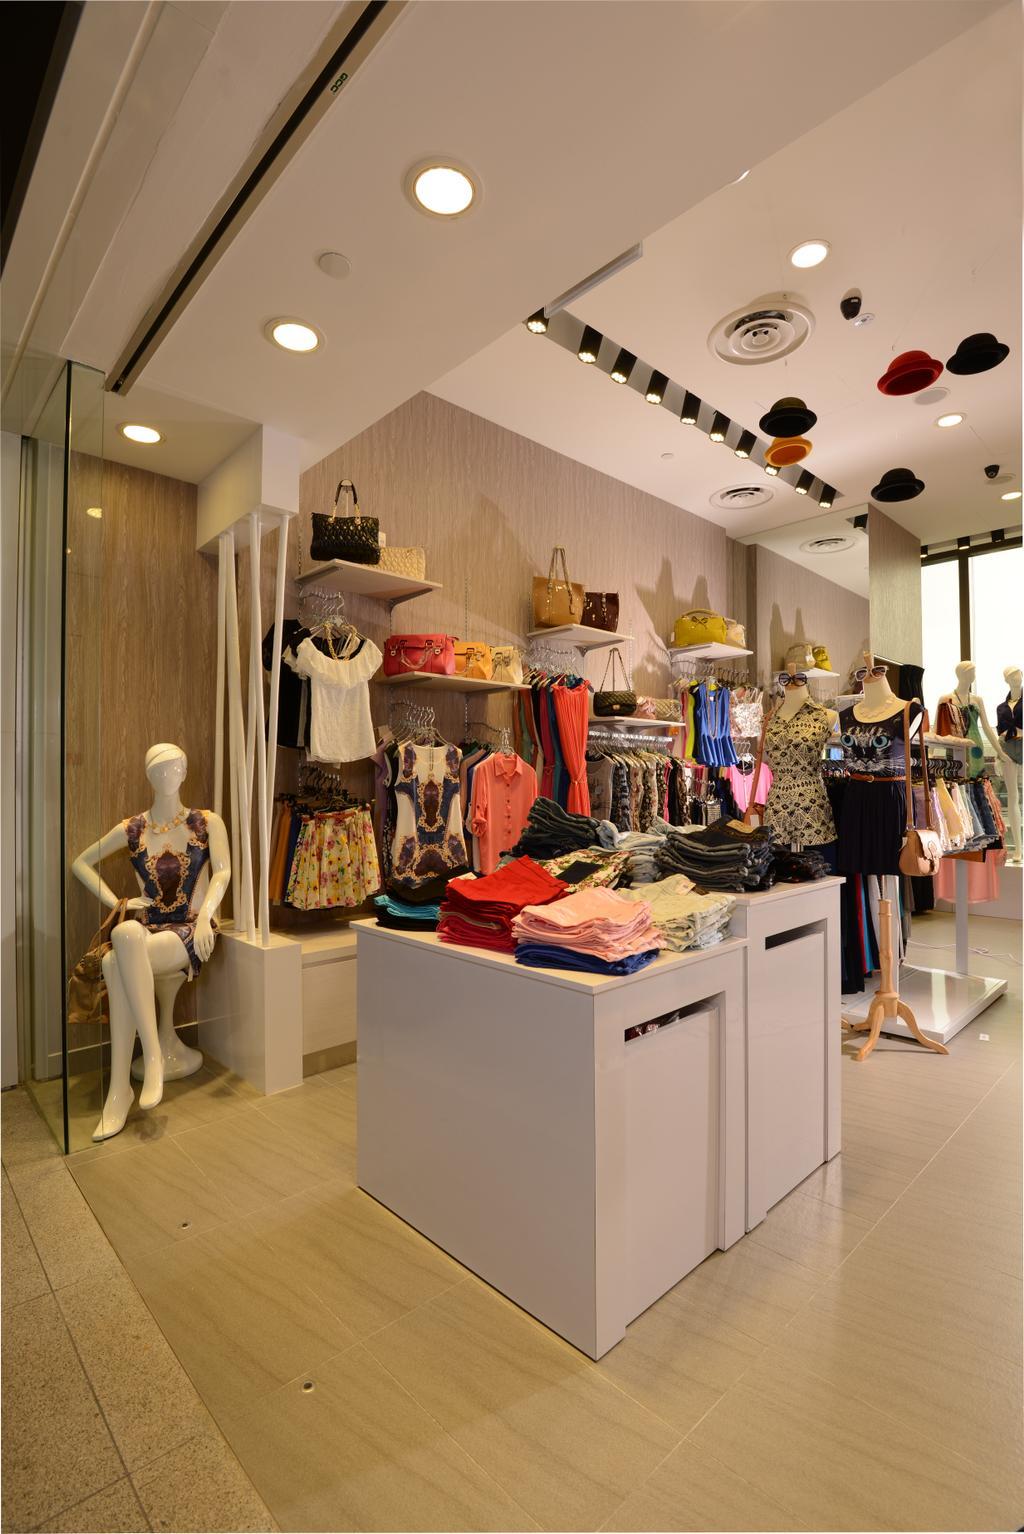 The D.X.E, Commercial, Interior Designer, Urban Habitat Design, Modern, Human, People, Person, Mannequin, Boutique, Shop